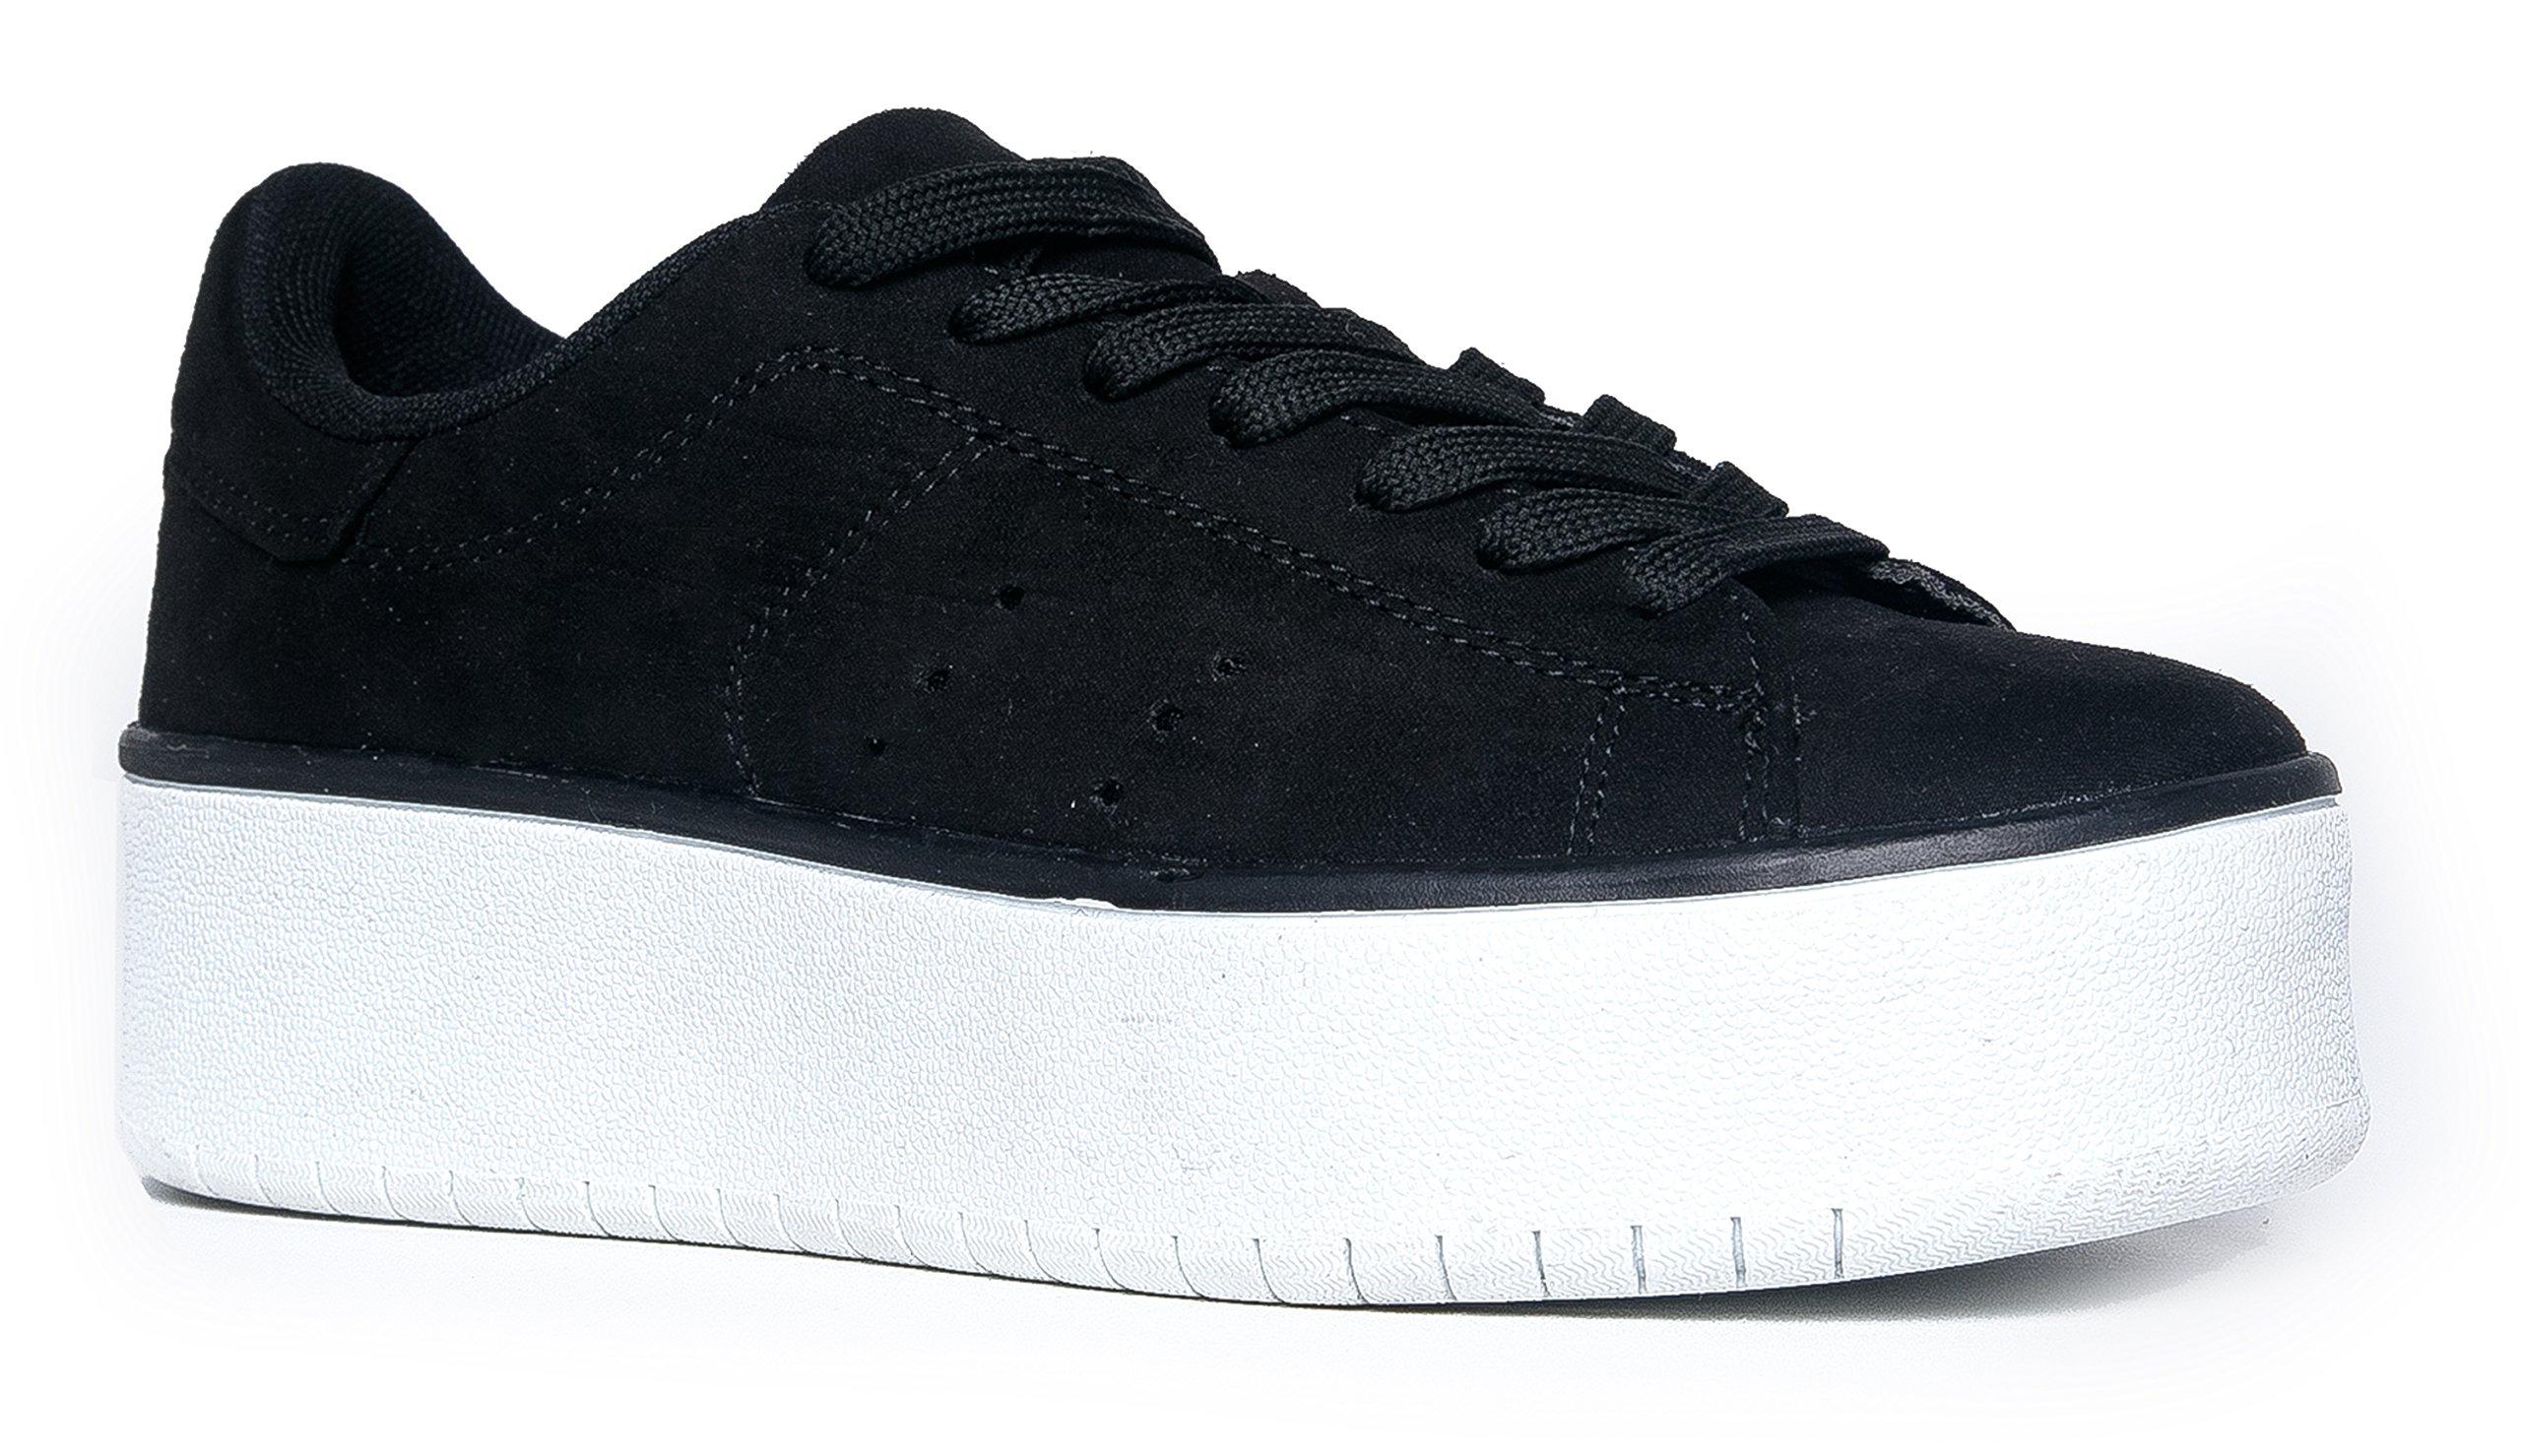 ebc6a4f73a Galleon - J. Adams Hero Platform Lace Up Sneaker Black Suede, 9 B(M) US